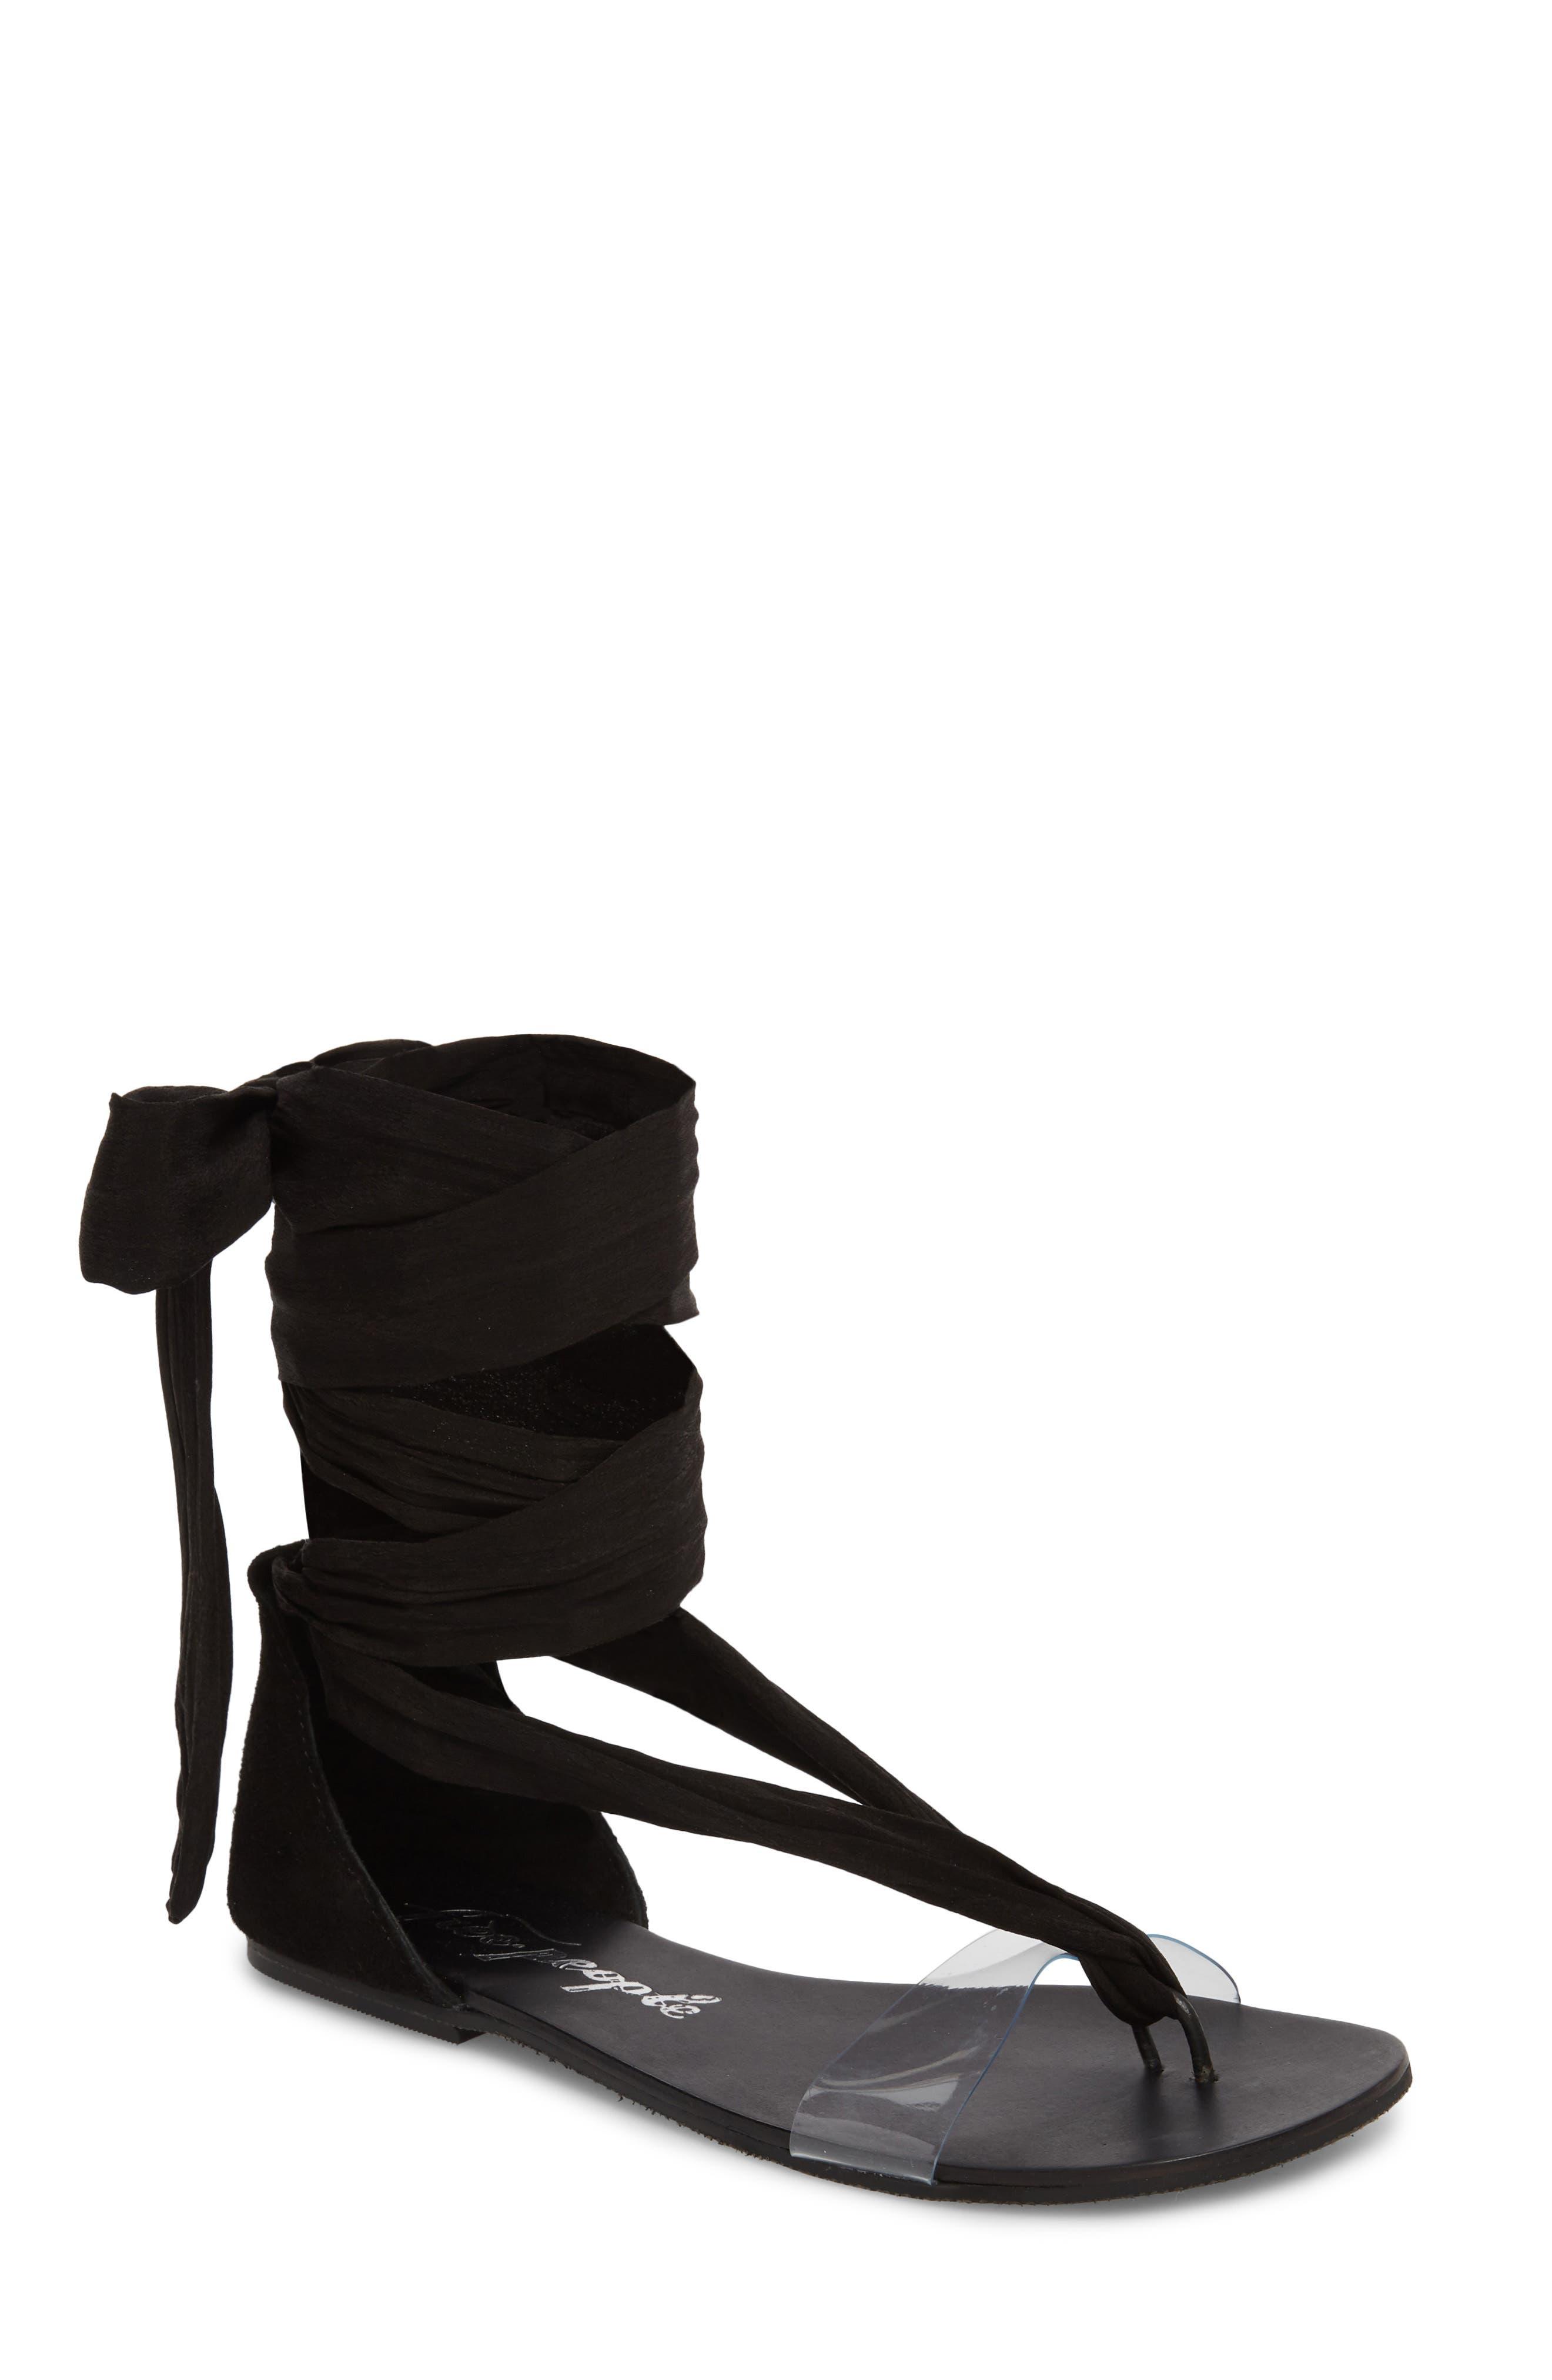 Barcelona Wrap Sandal,                         Main,                         color, 001